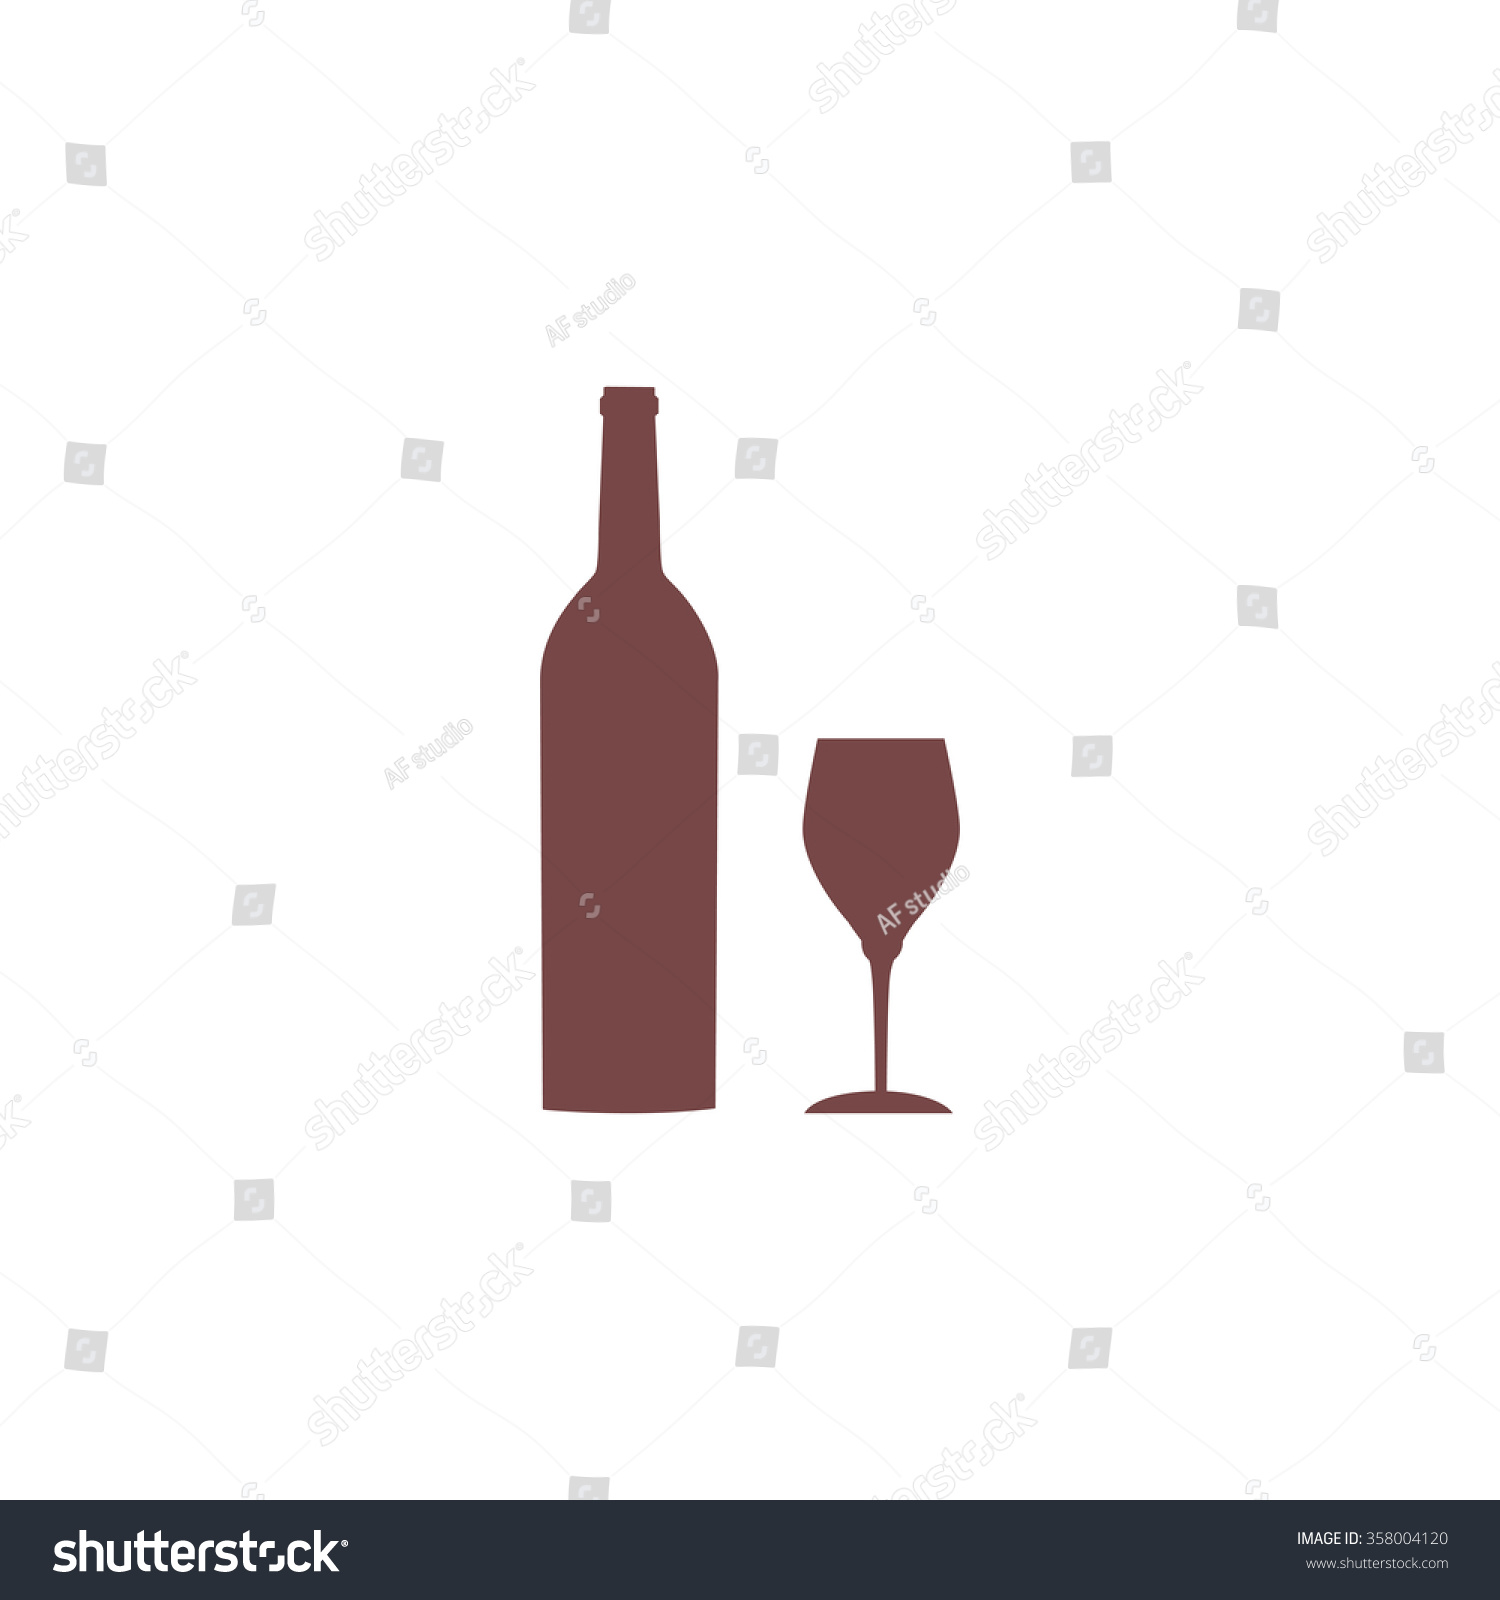 Bottle wine glass colorful vector icon stock vector 358004120 bottle of wine and glass colorful vector icon simple retro color modern illustration pictogram biocorpaavc Gallery